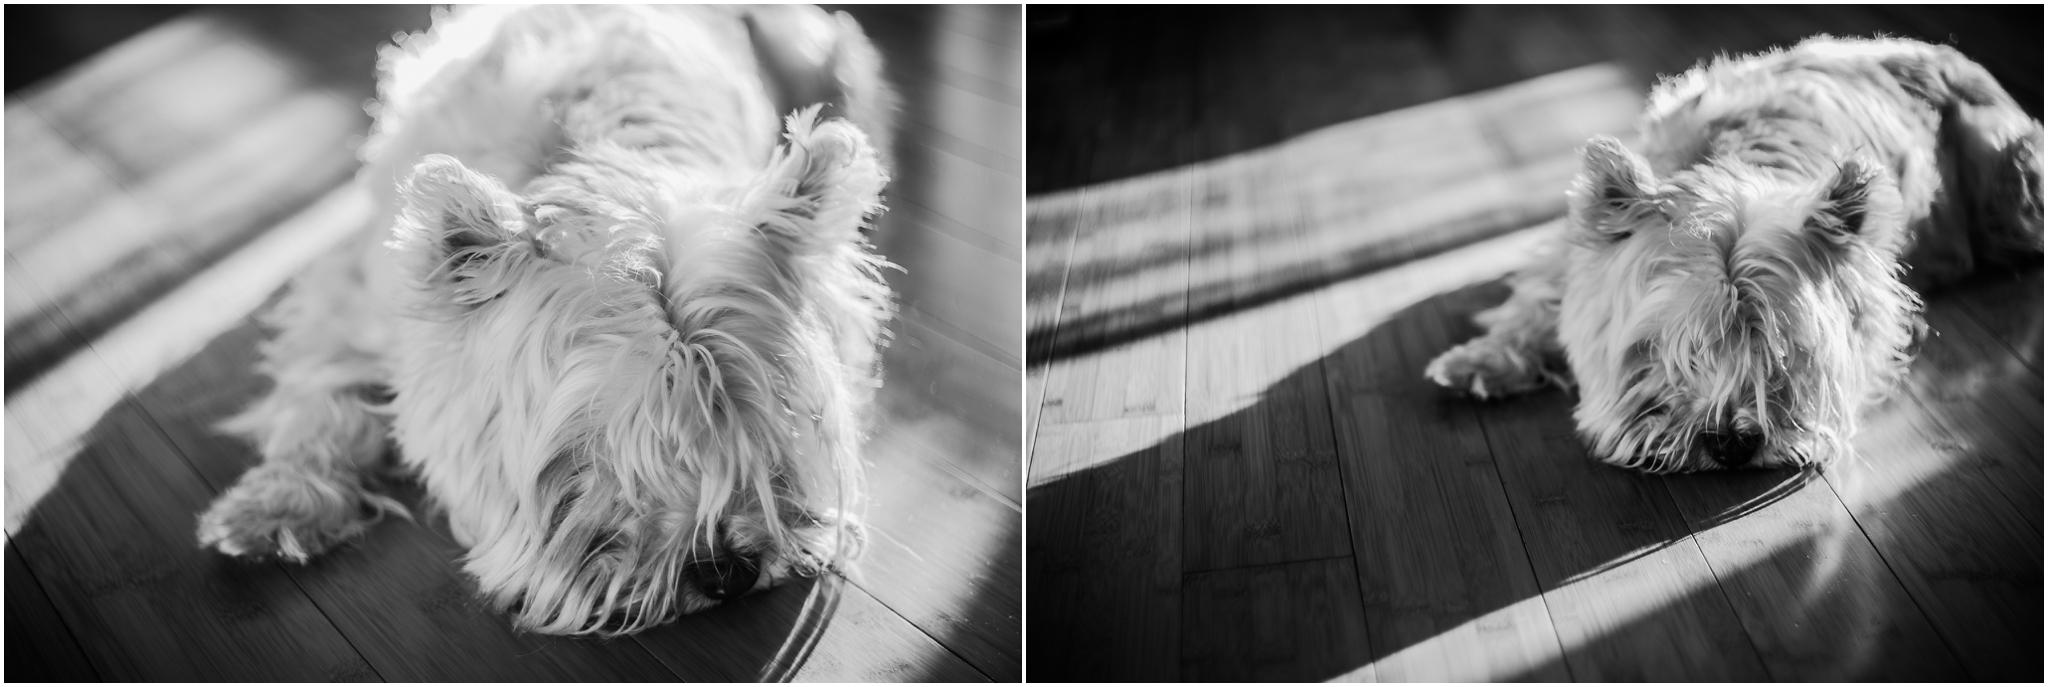 Treelines Photography - National Puppy Day 2017 - Edmonton Photographer - West Highland Terrier